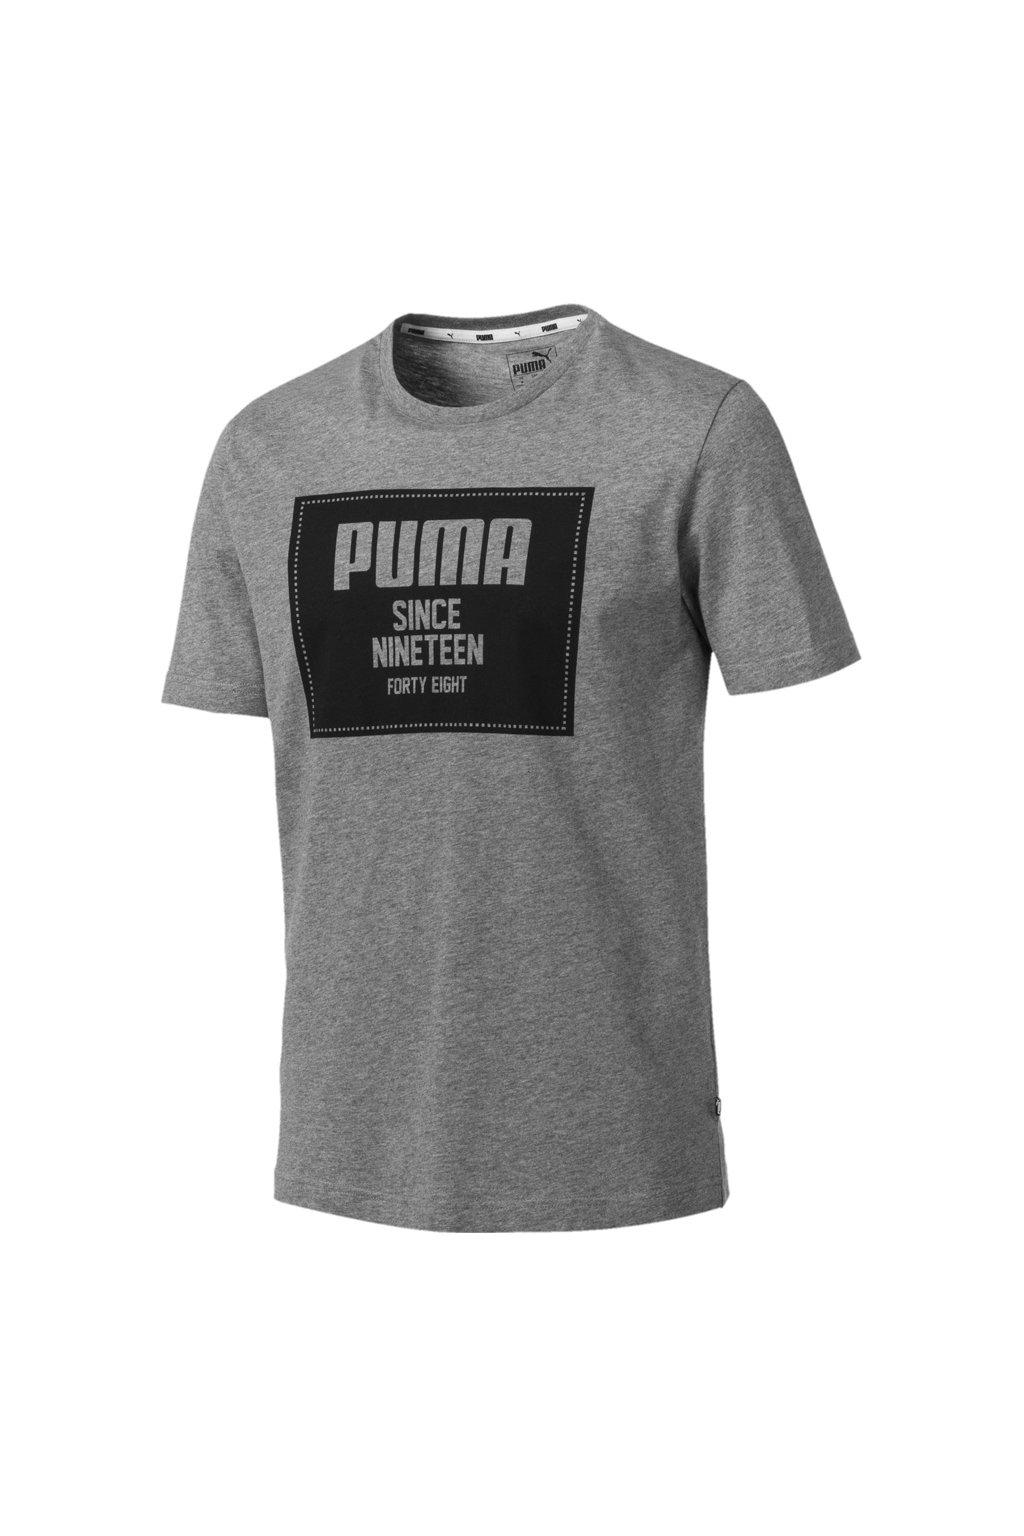 Pánske tričko Puma Rebel Block Basic Tee šedé 852395 03